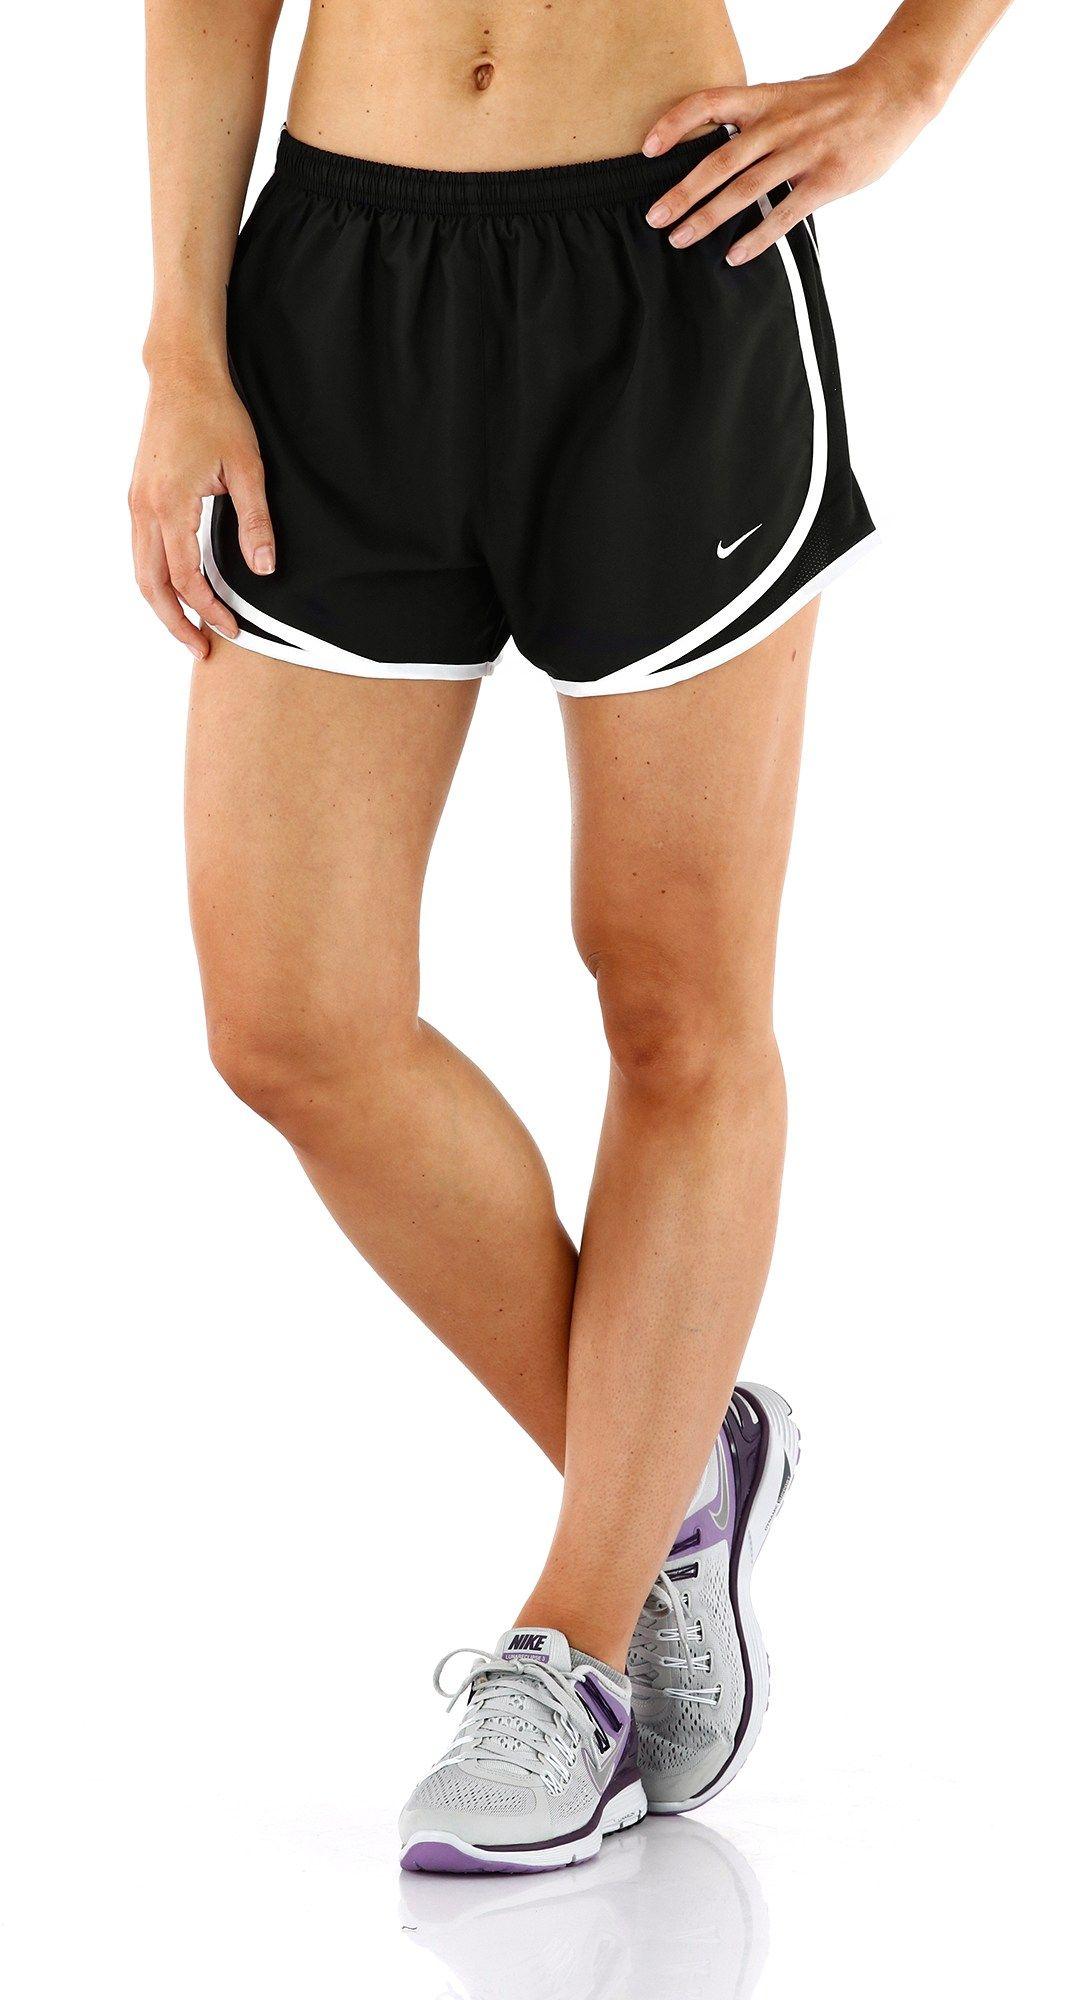 Nike Female Tempo Shorts - Women's